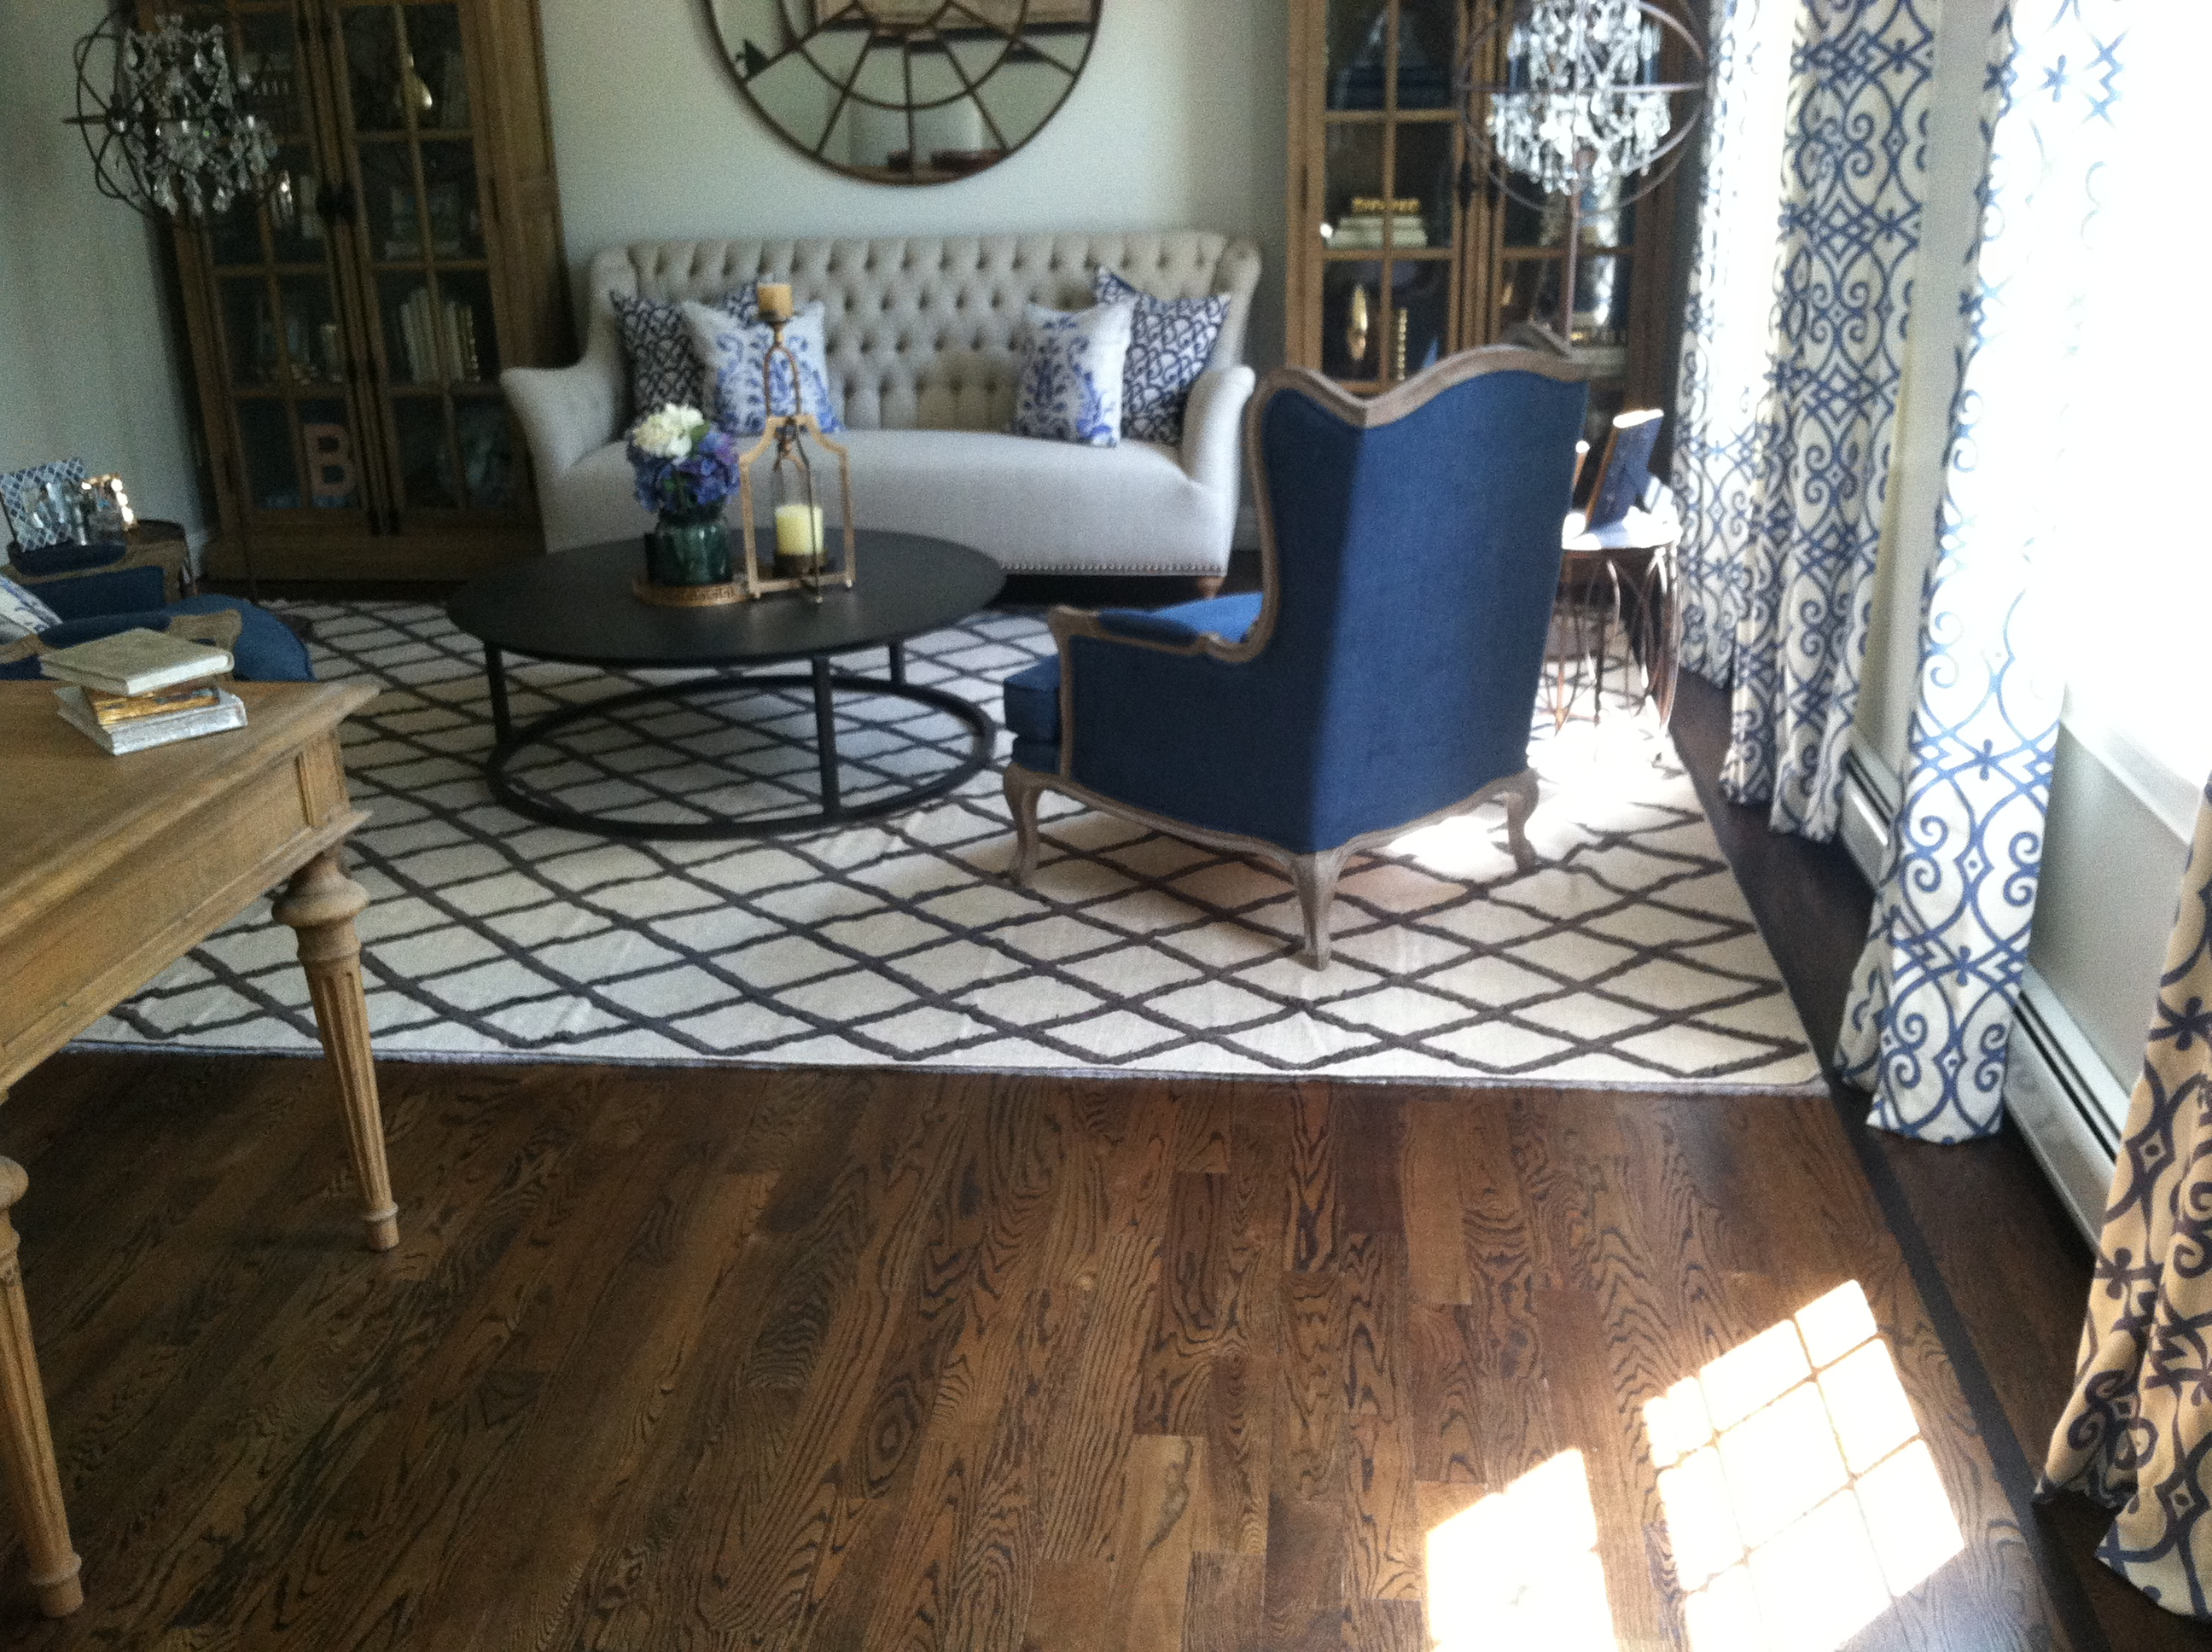 family-room-following-dustless-sanding-and-refinishing-of-floors